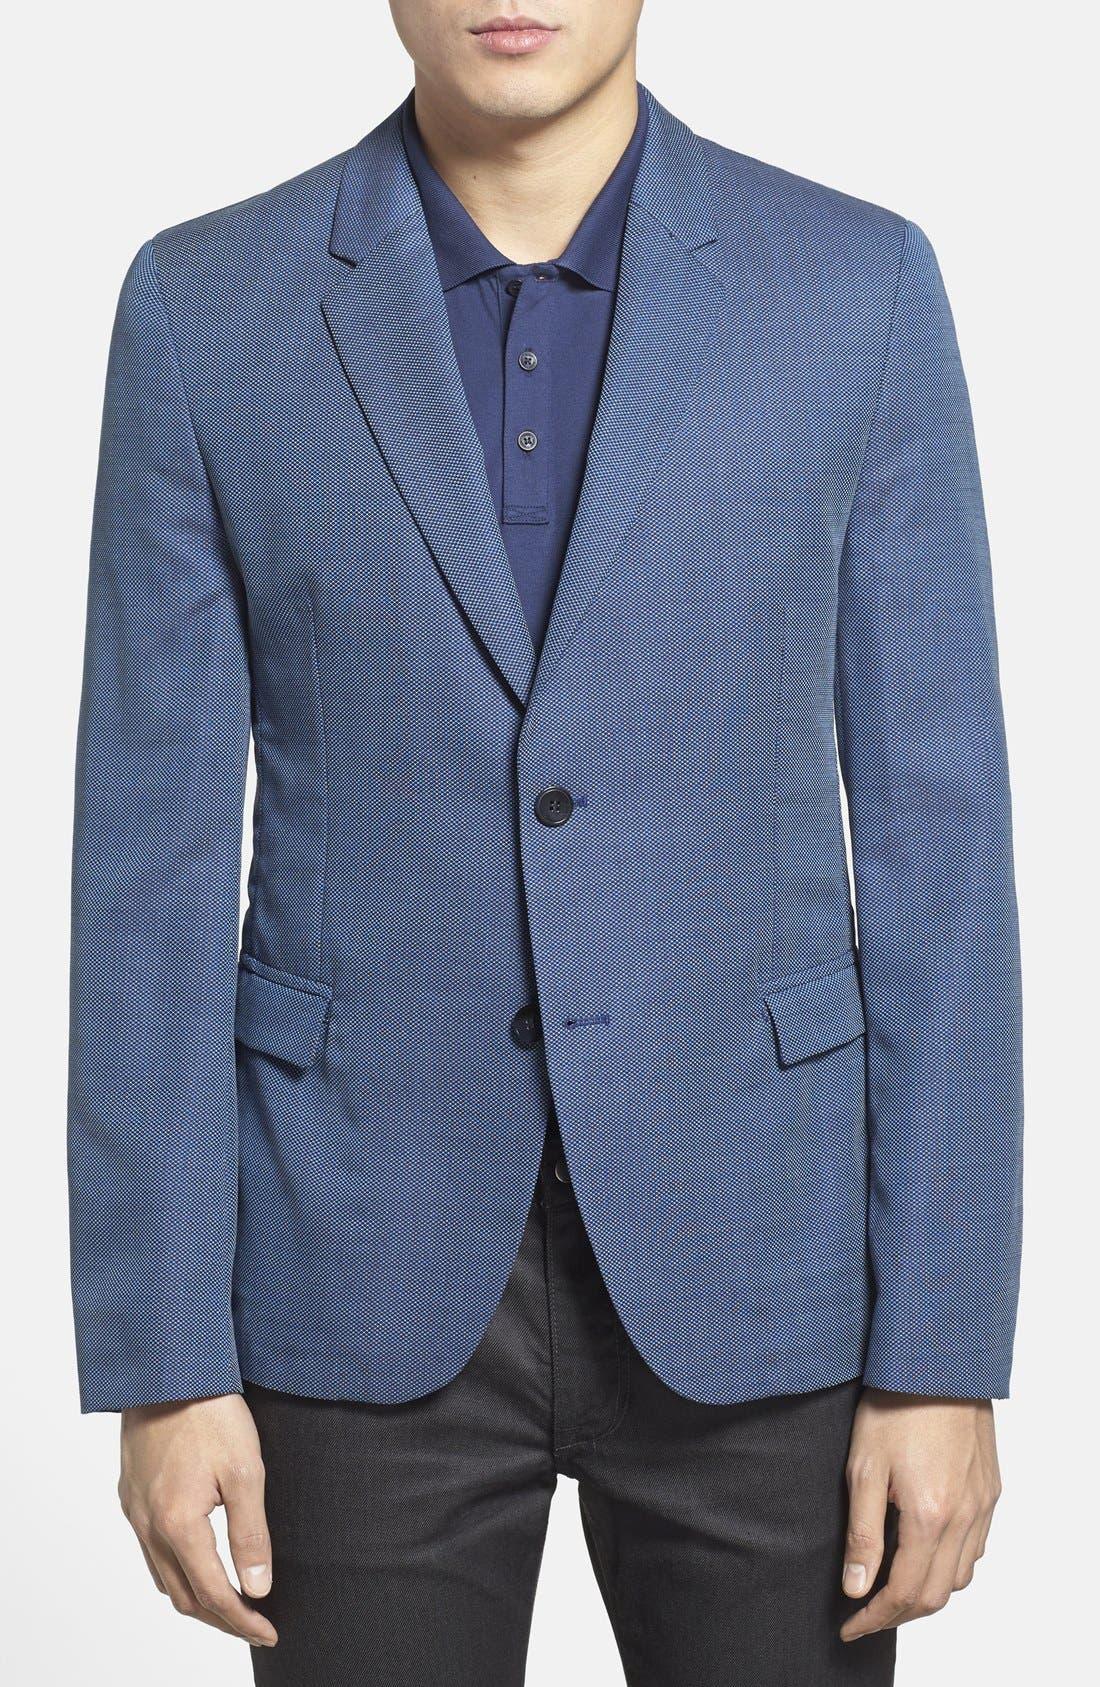 ZZDNUHUGO BOSS HUGO 'Arnandos' Slim Fit Virgin Wool Sport Coat, Main, color, 420